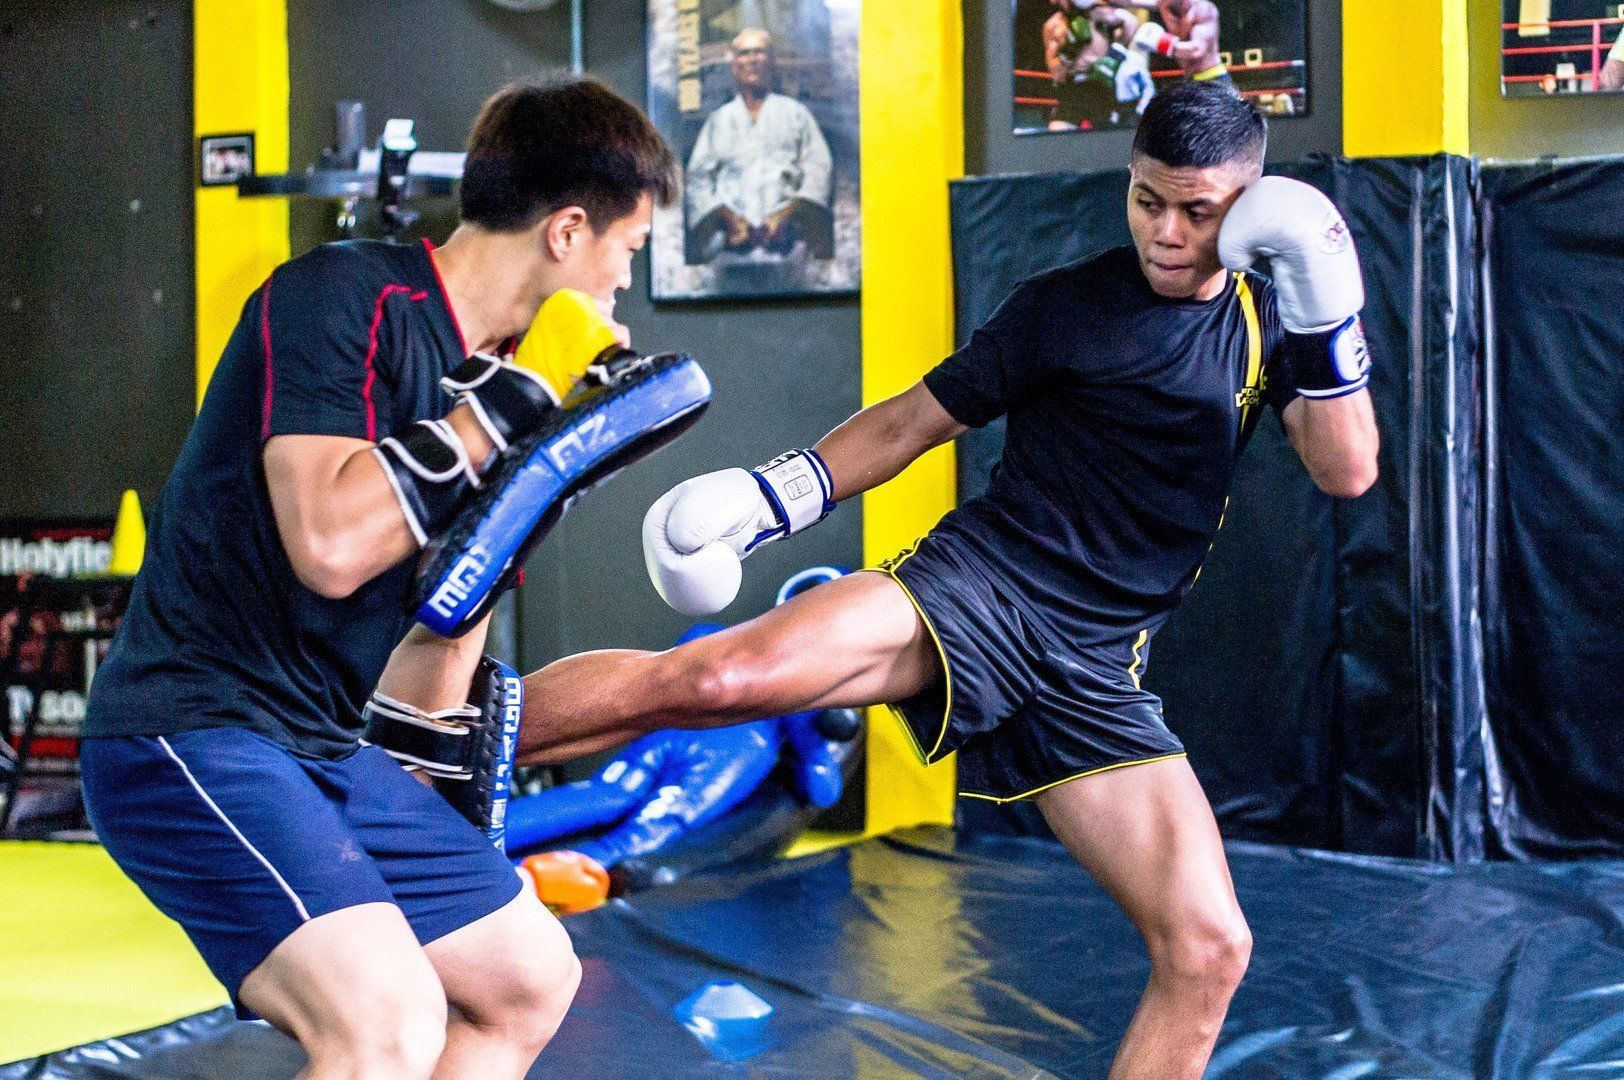 Muay Thai practice at Juggernaut Fight Club in Singapore